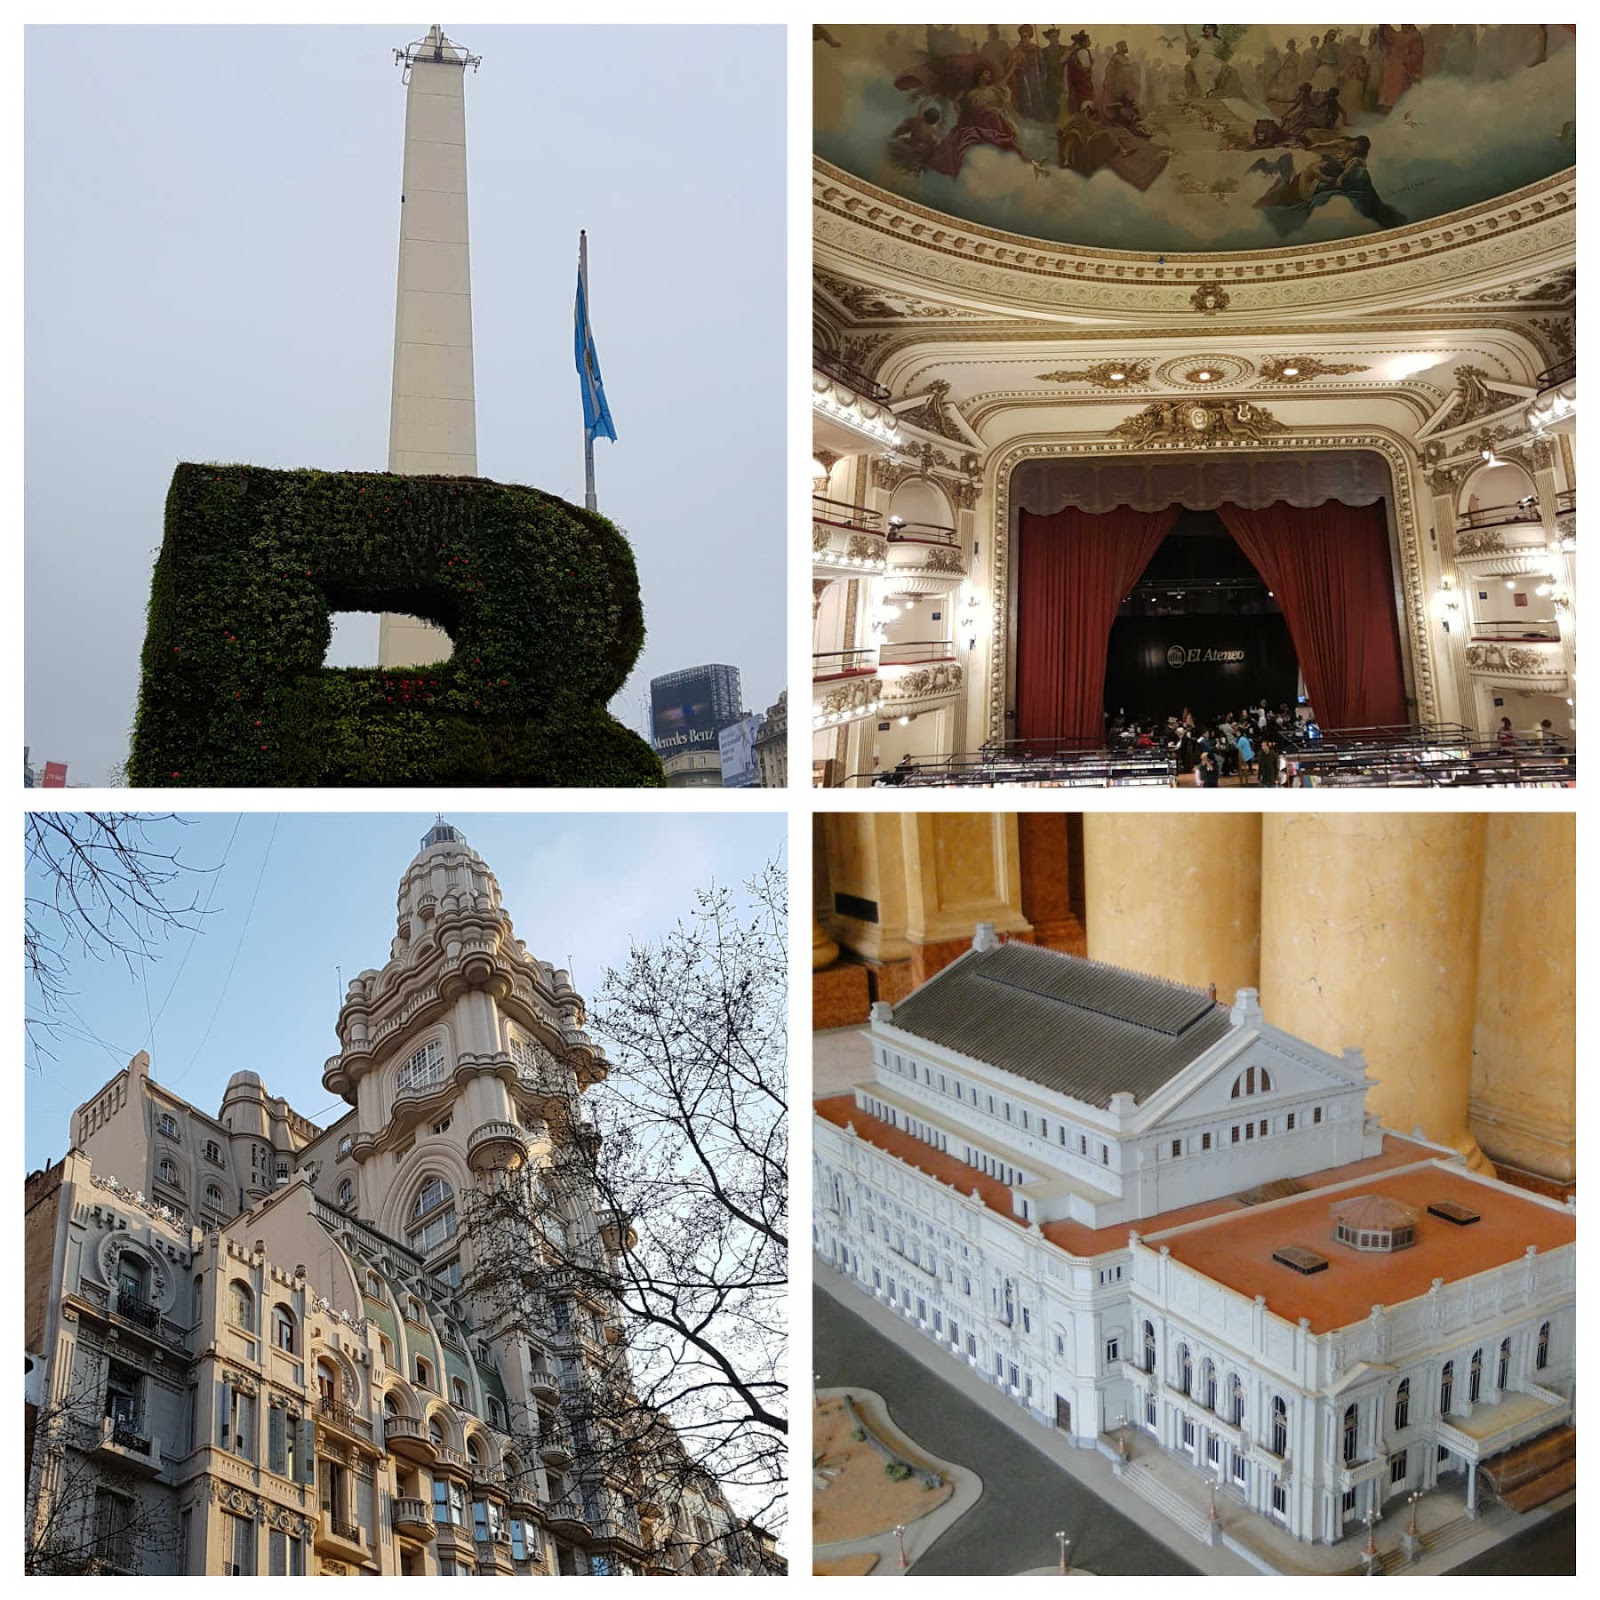 Obelisco da 9 de Julho, Livraria El Ateneo, Palácio Barollo e Teatro Colón em Buenos Aires.